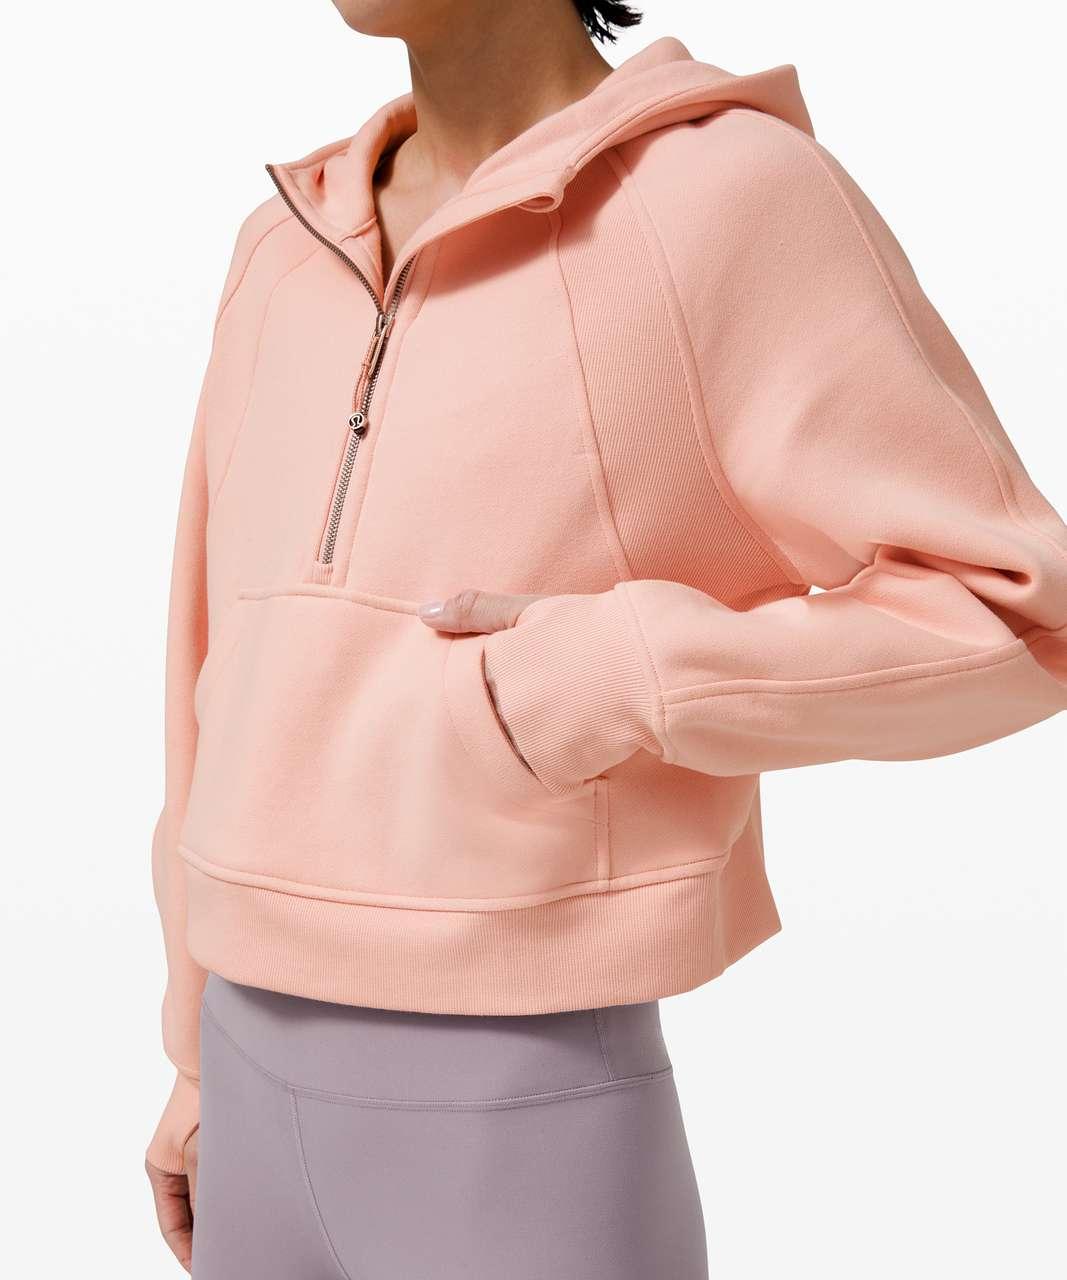 Lululemon Scuba Oversized 1/2 Zip Hoodie - Pink Mist